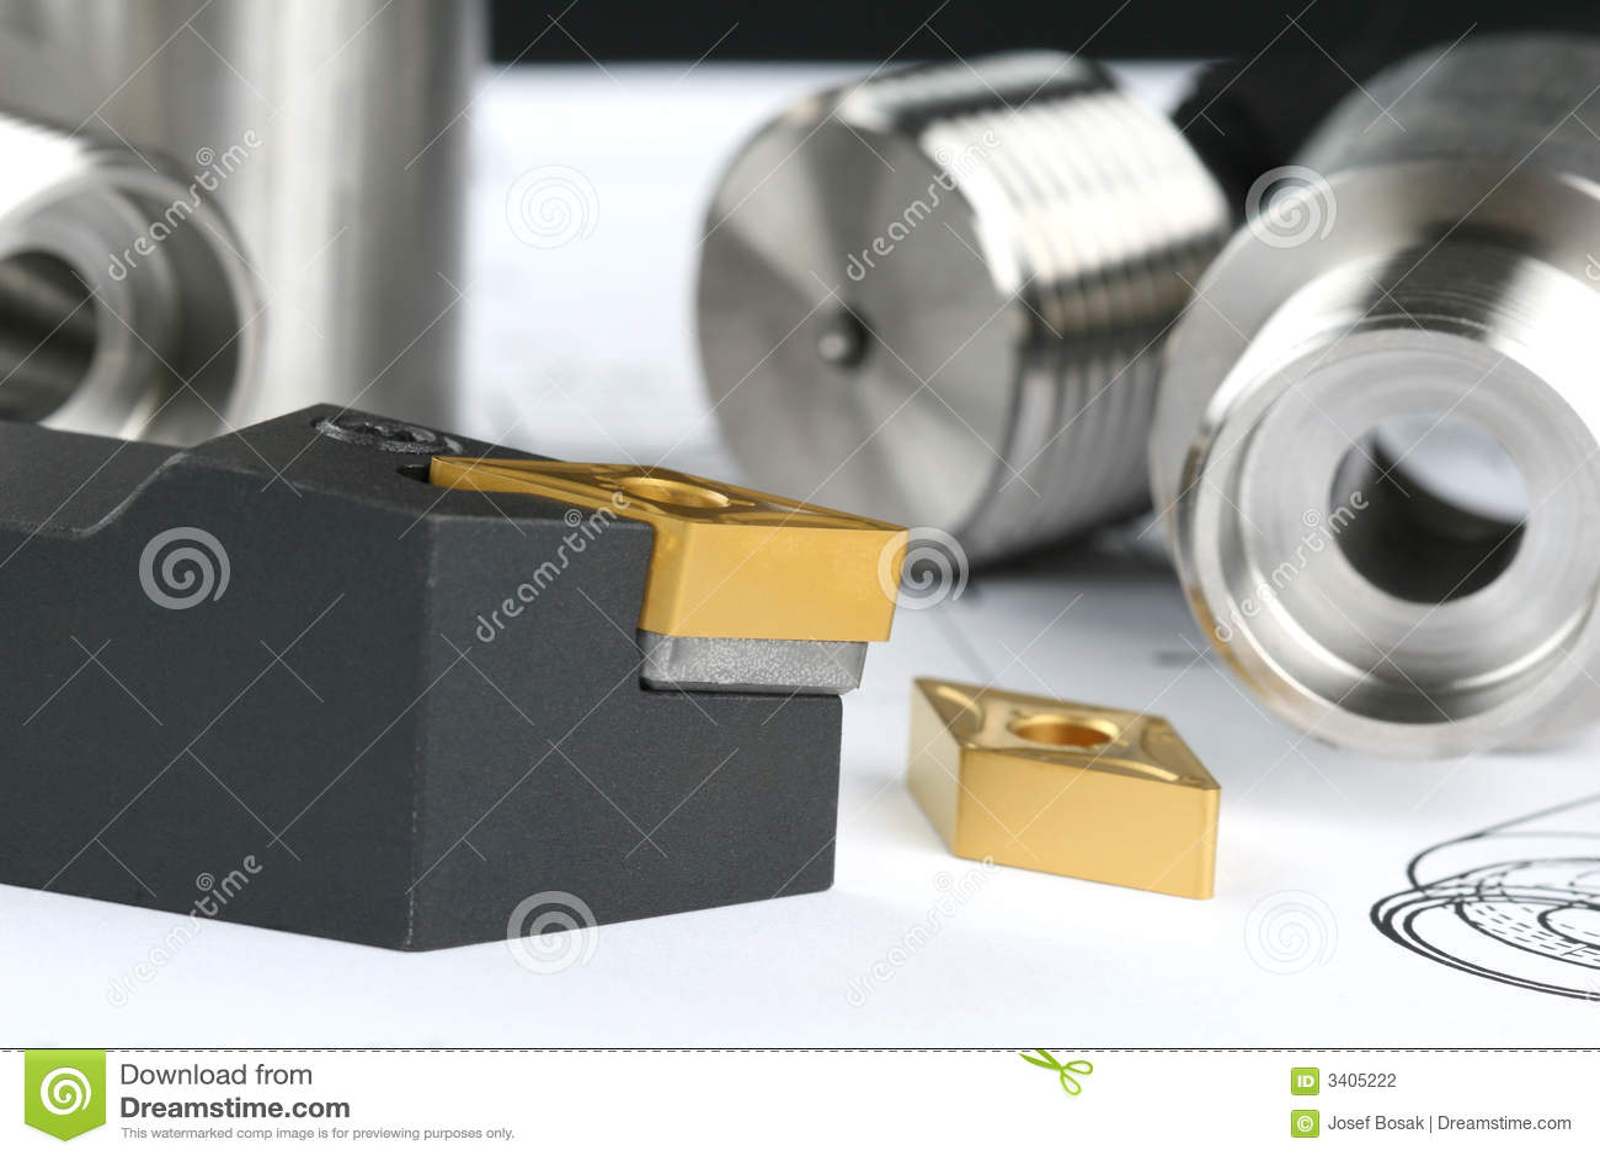 Lathe tool